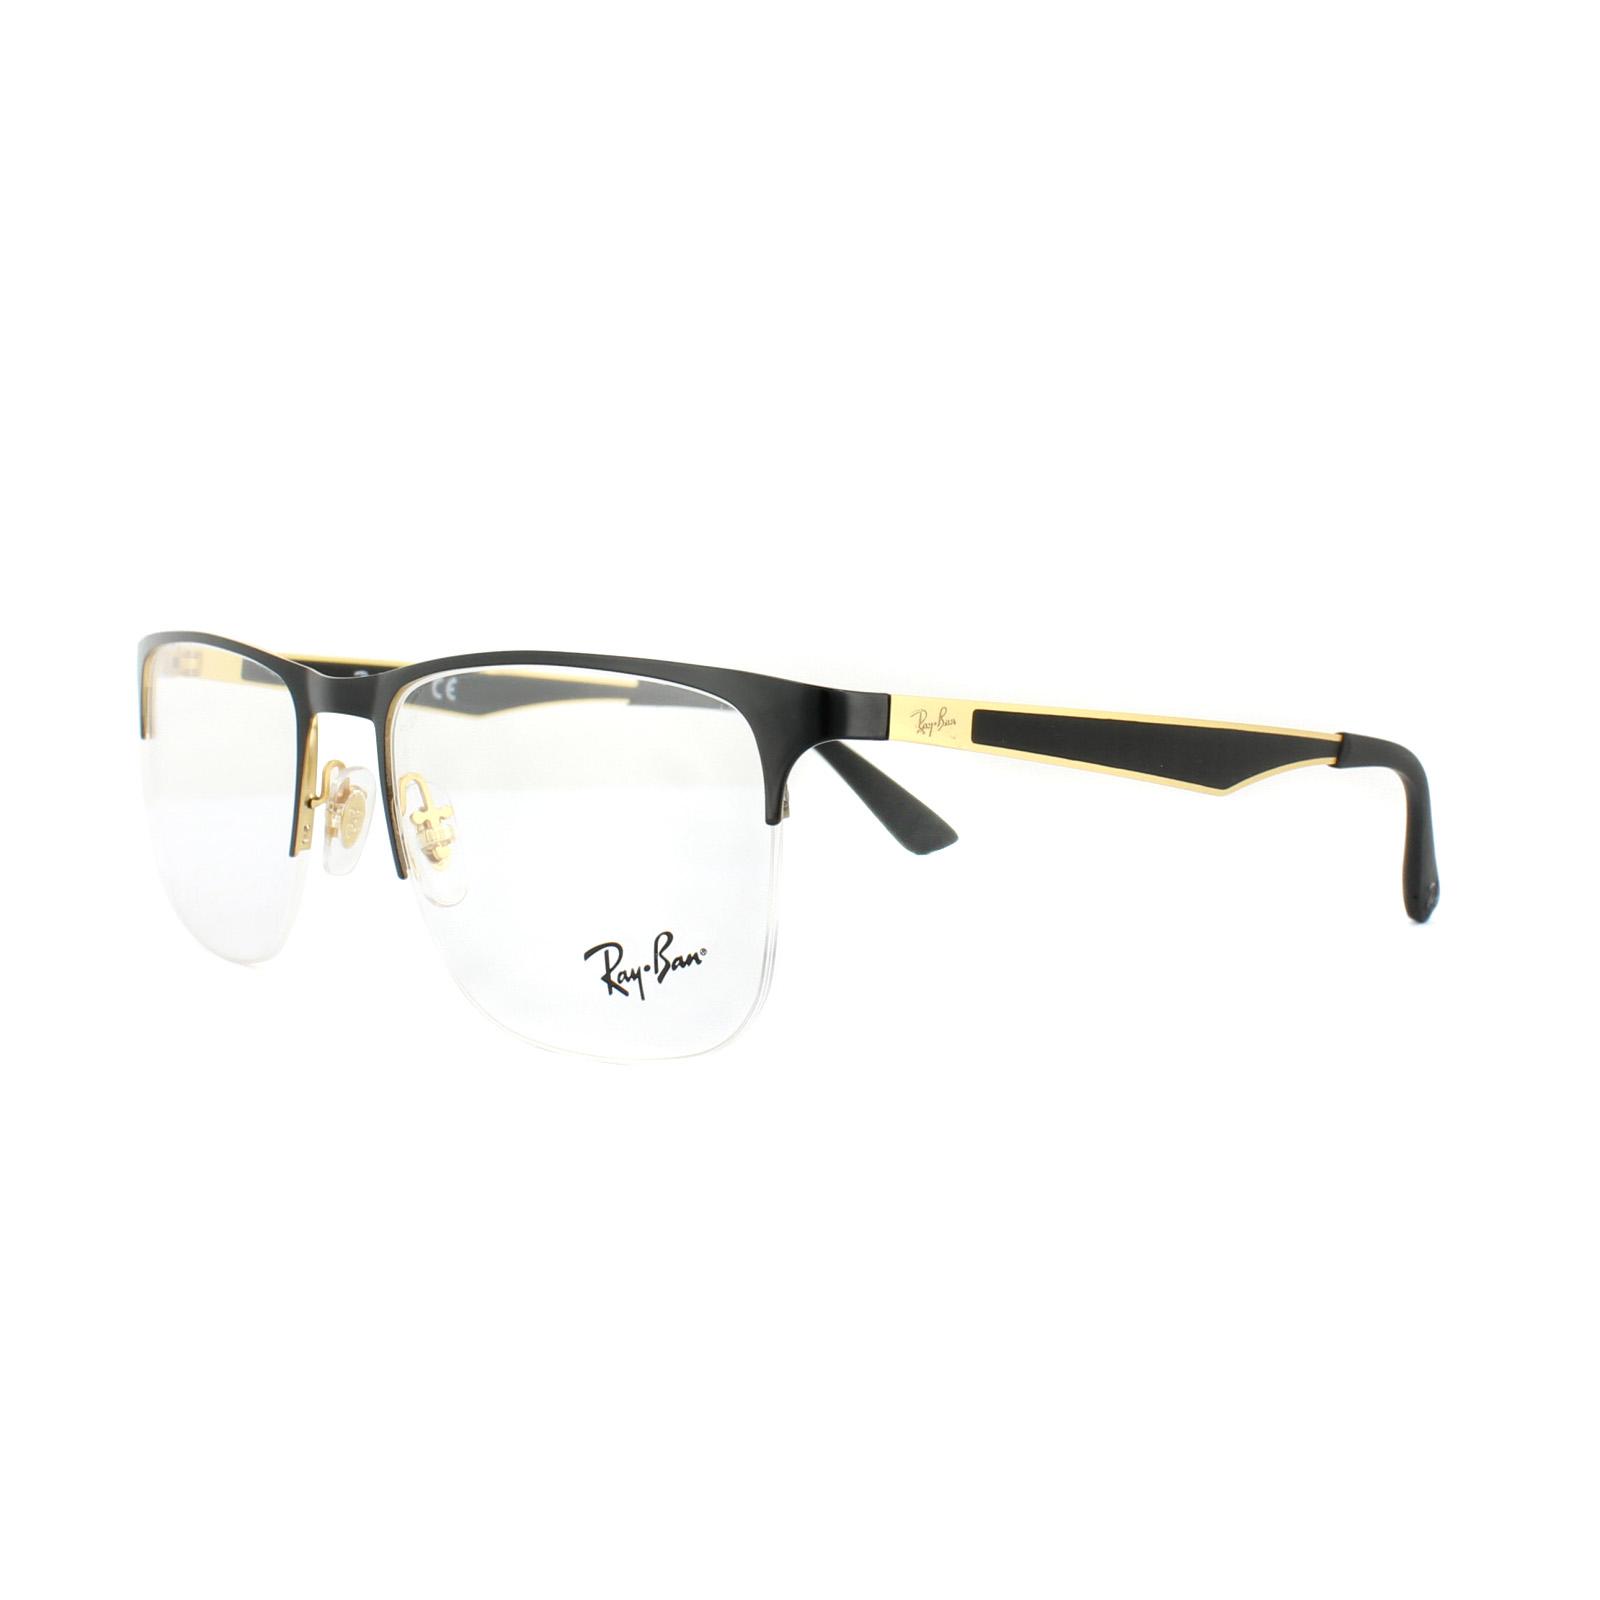 Ray-Ban Glasses Frames RX 6362 2890 Gold Top Shiny Black Mens 55mm ...